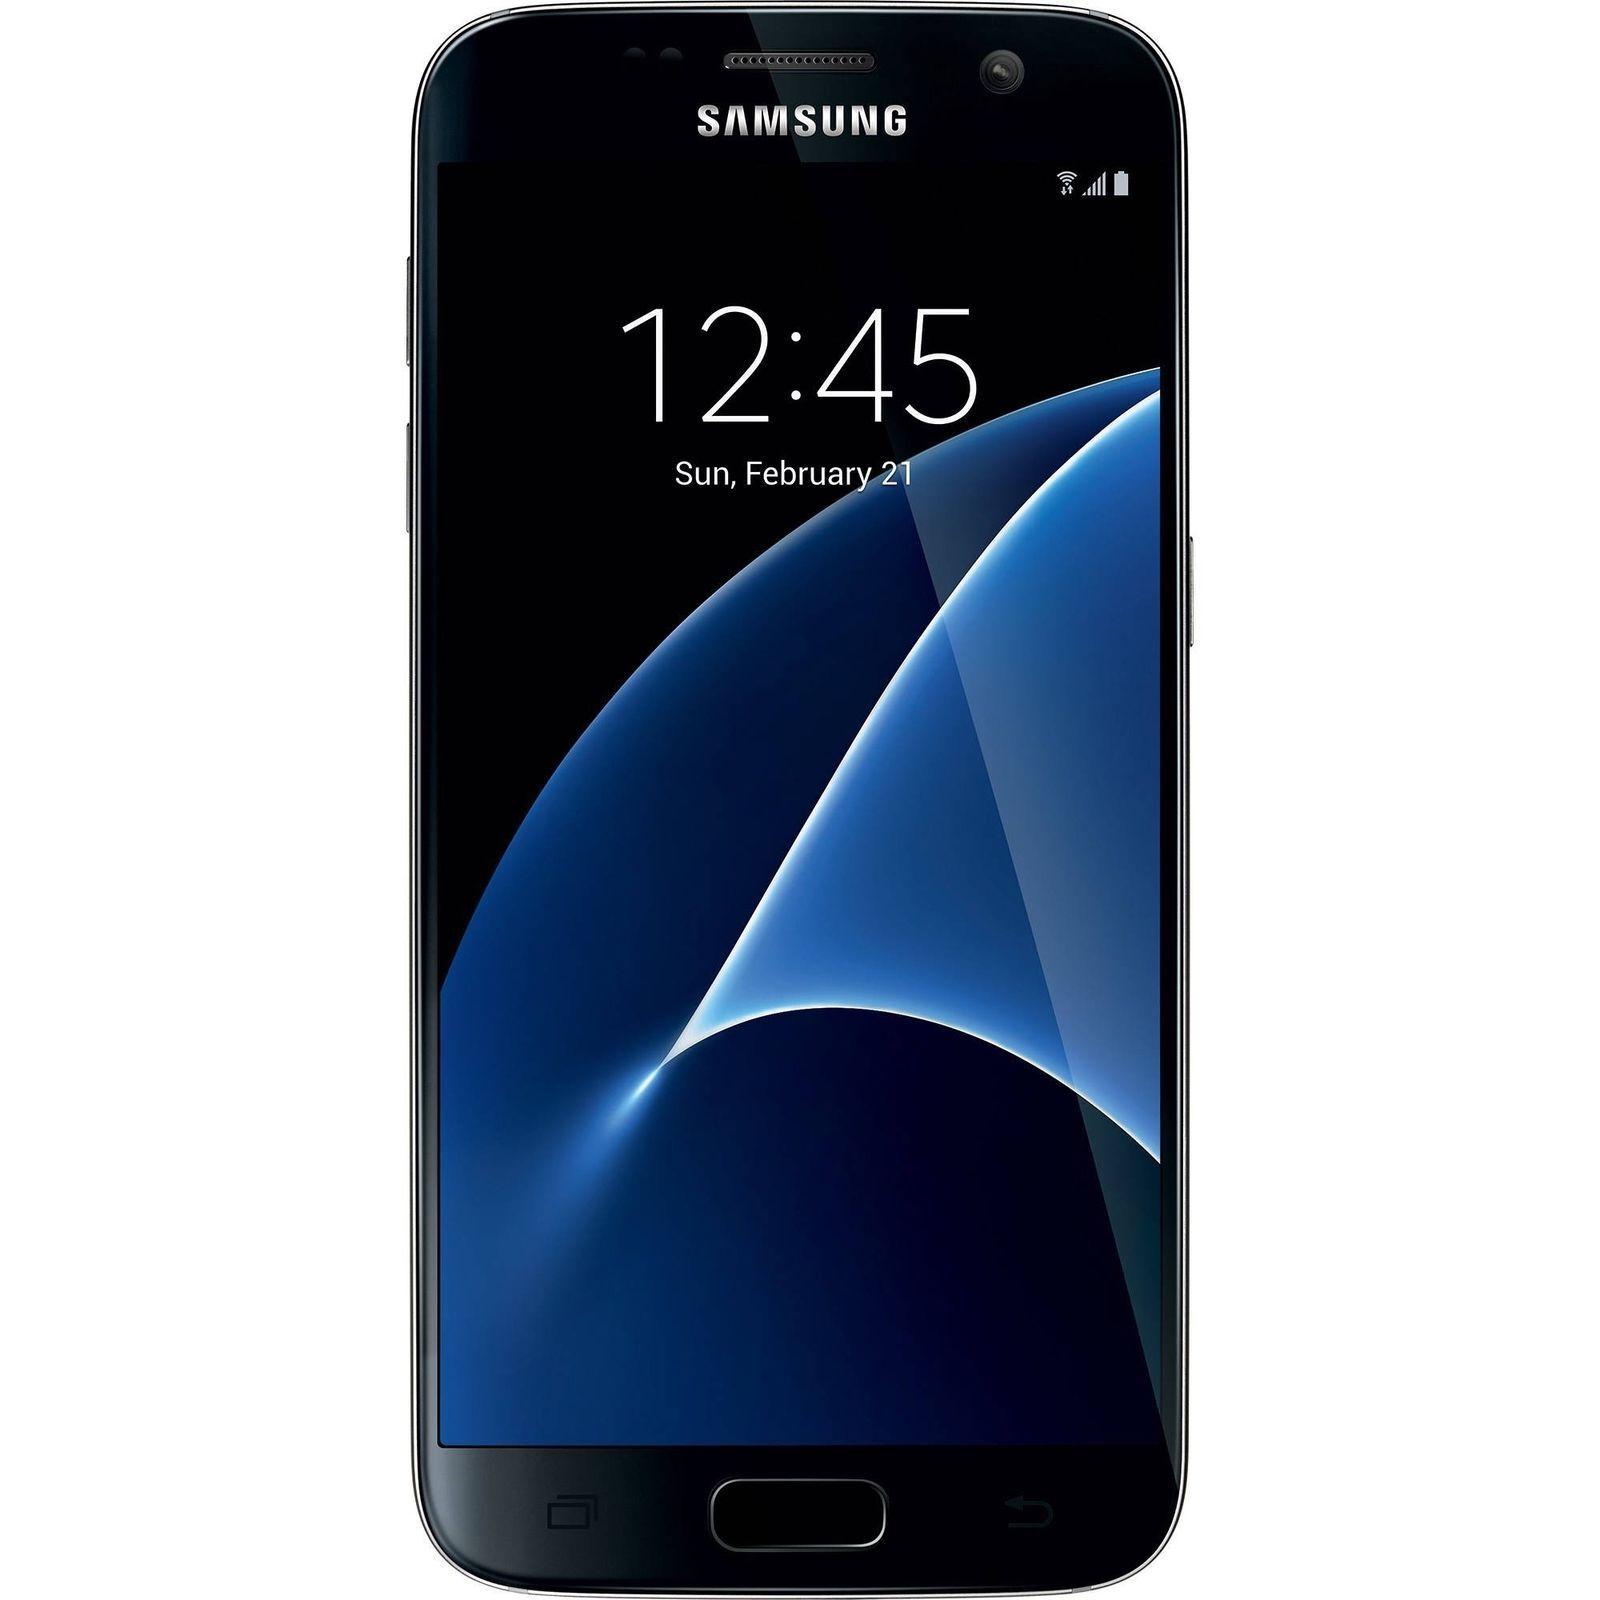 Samsung Galaxy S7 32GB Straight Talk LTE Prepaid Smartphone - Black Onyx